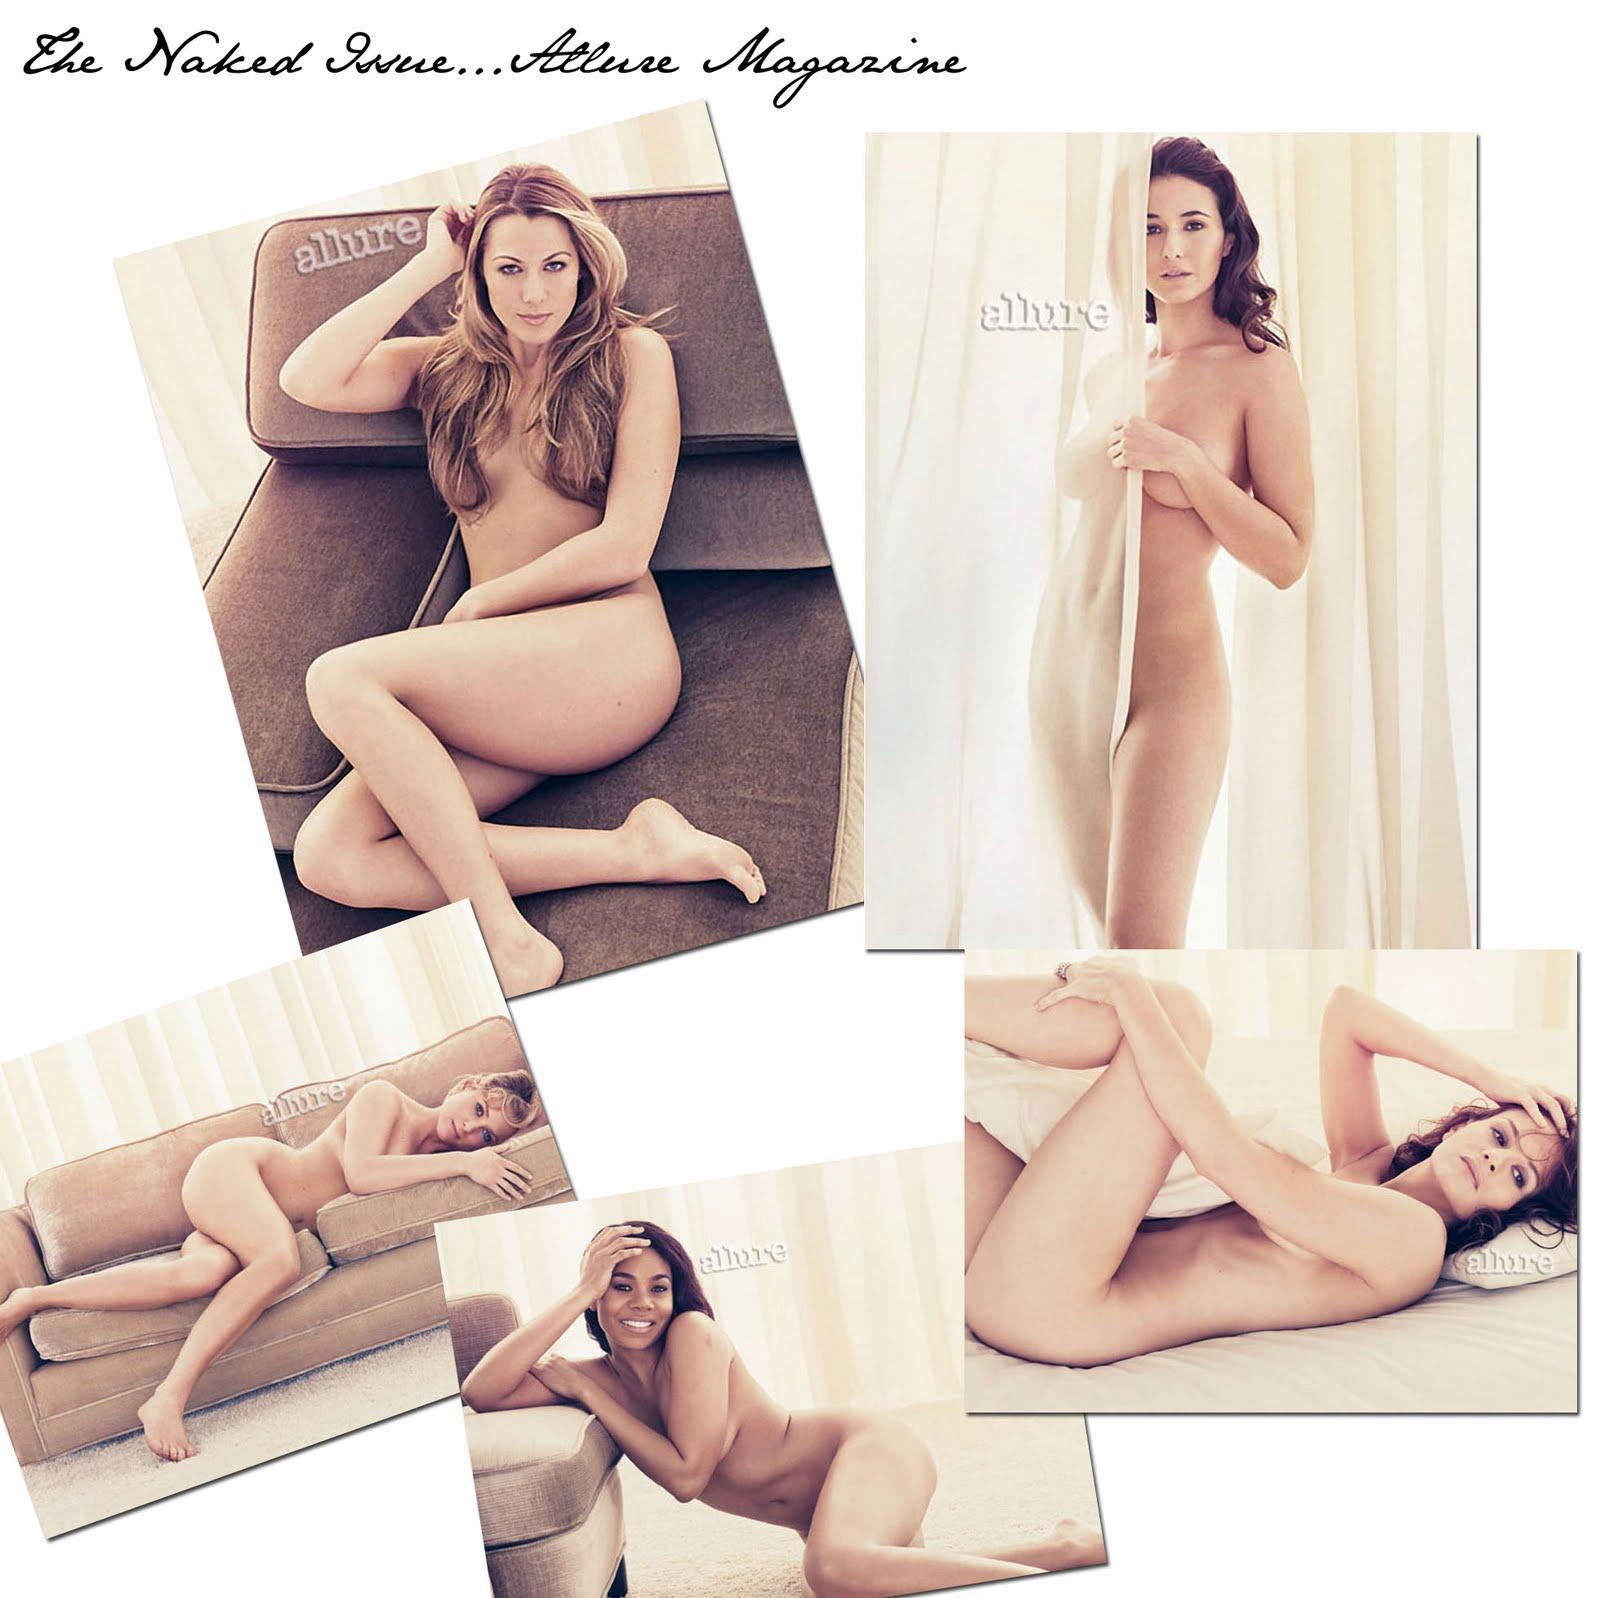 Colbie caillat hintern nackt, Catrinel Menghia Bikini